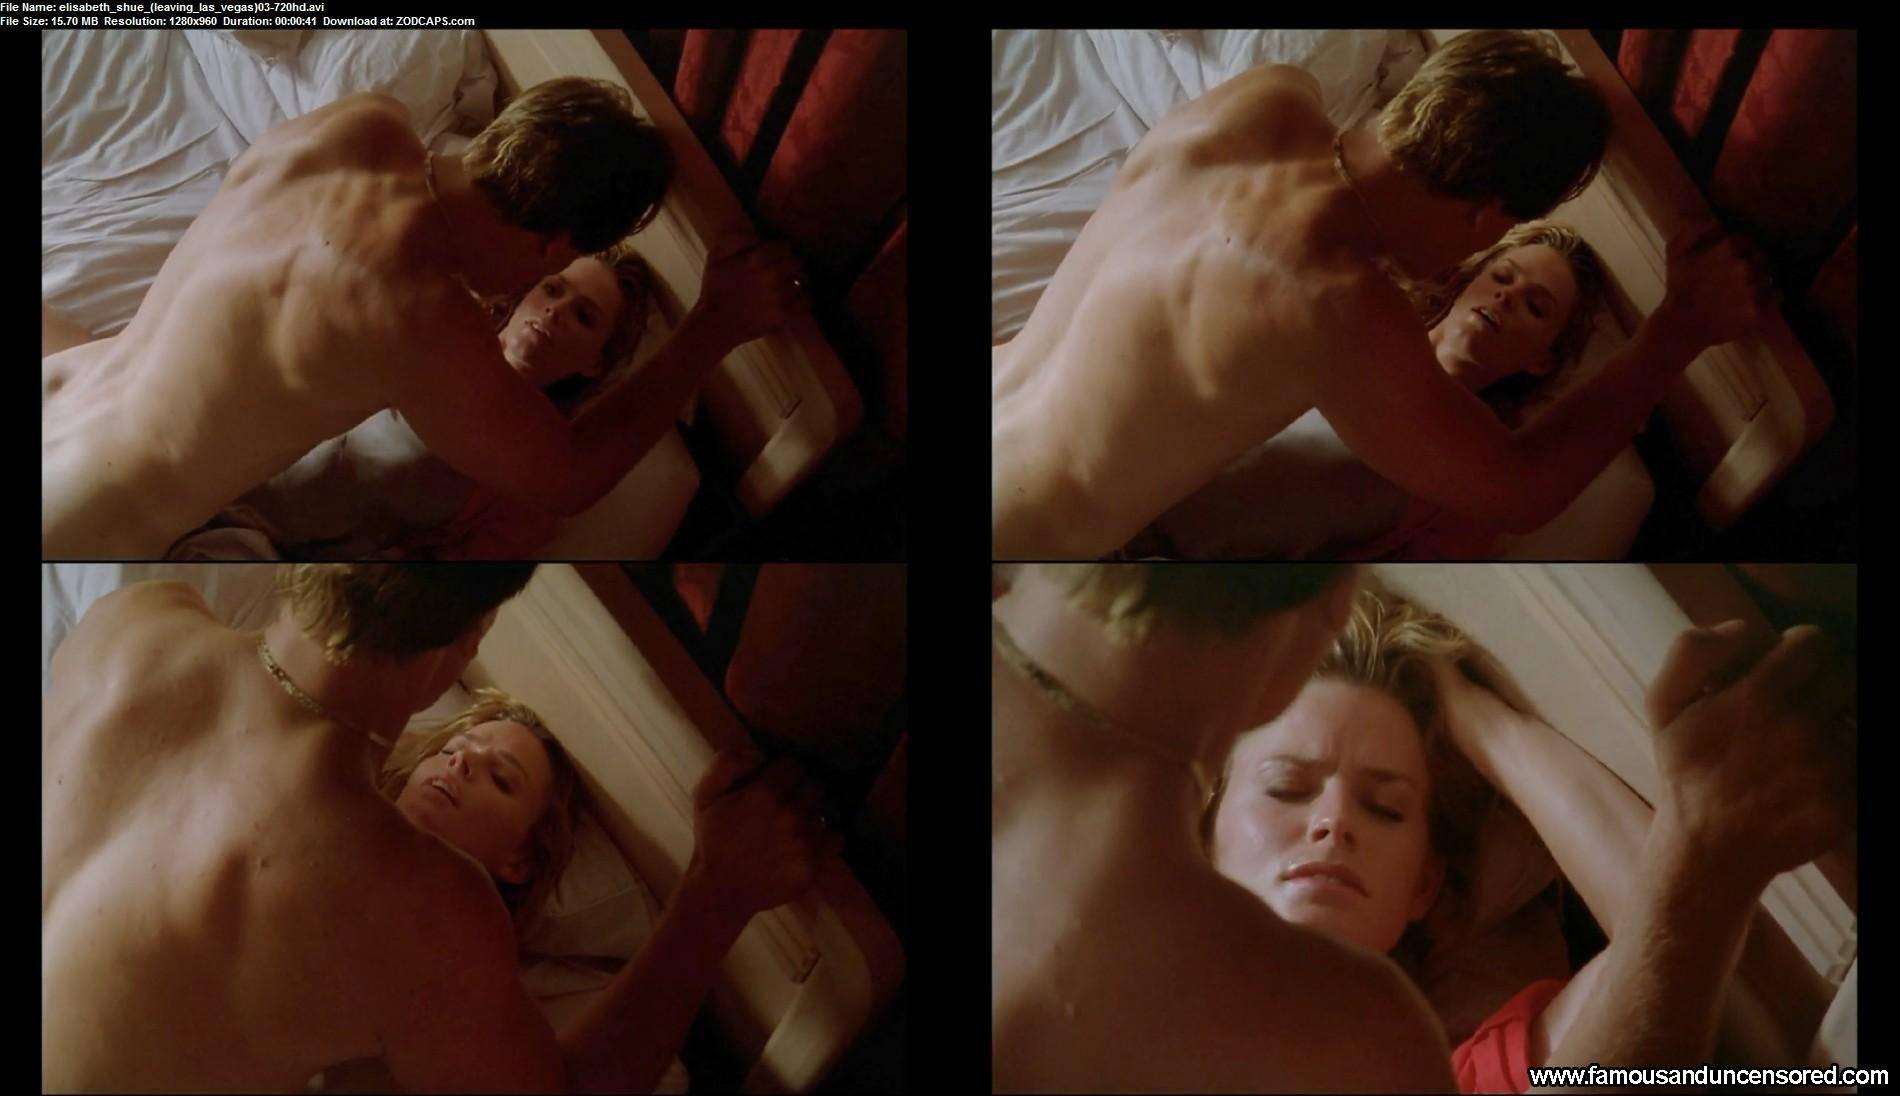 Elisabeth shue nude in what films